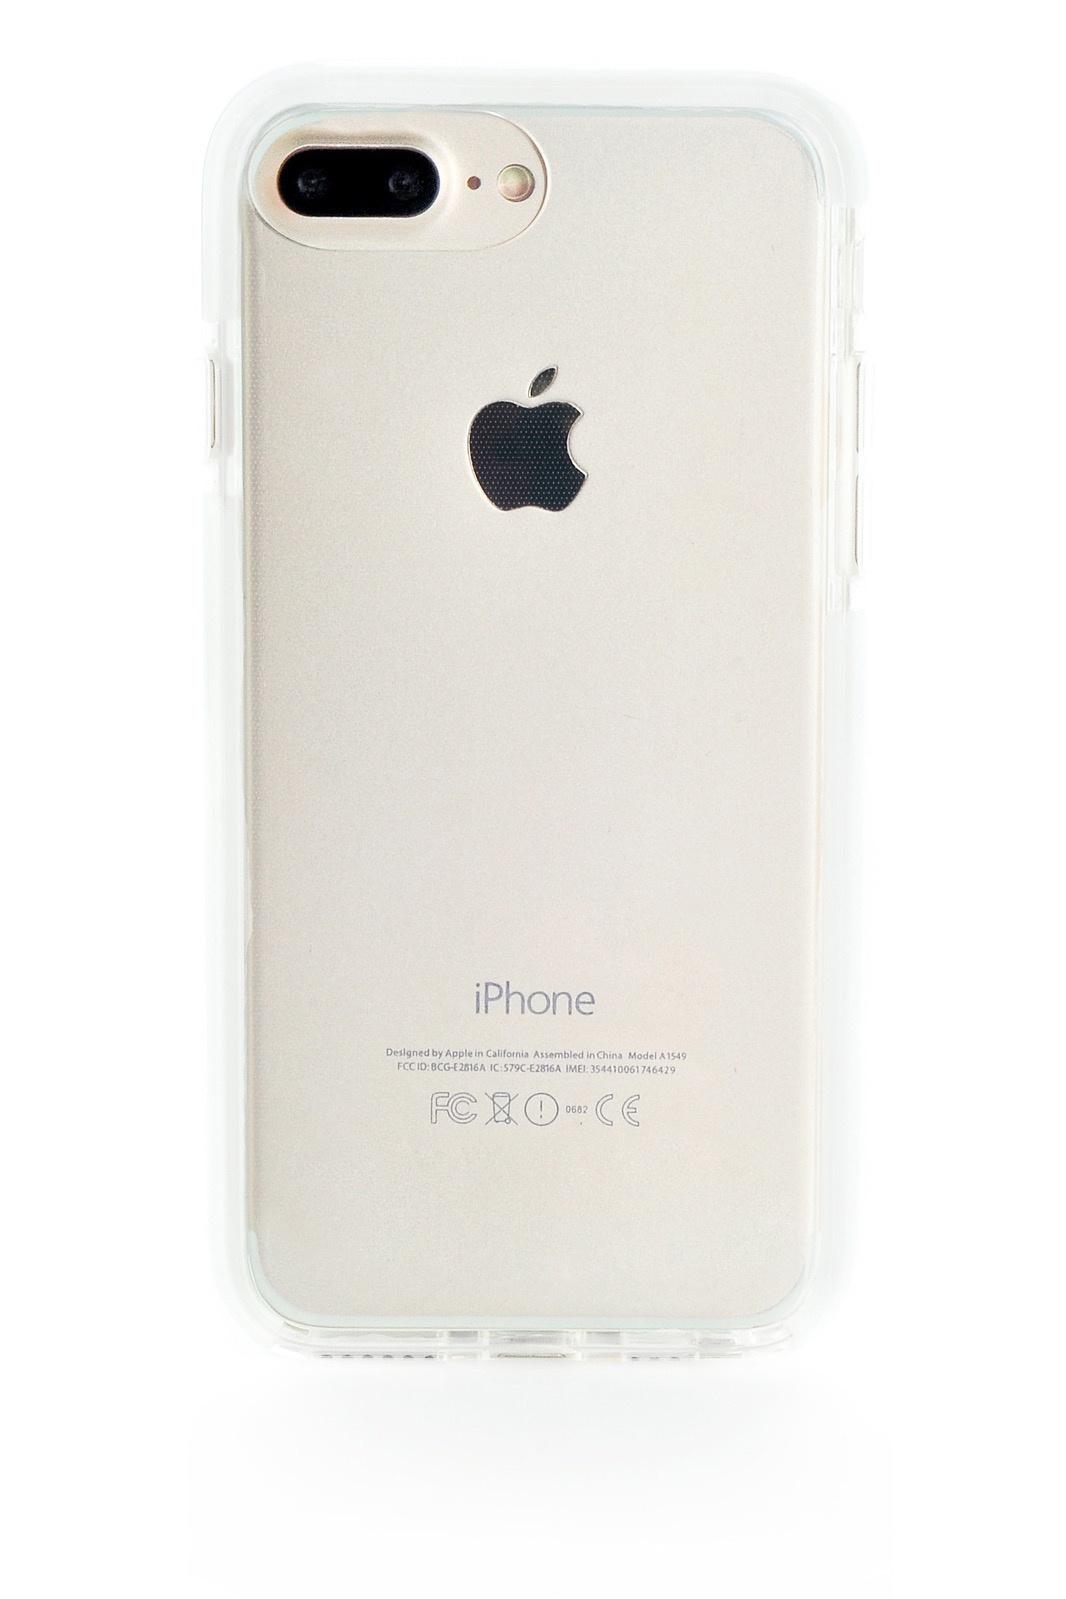 "Чехол для сотового телефона Gurdini Crystal Ice 905653 силикон противоударный для Apple iPhone 6 Plus/7 Plus/8 Plus 5.5"", белый"